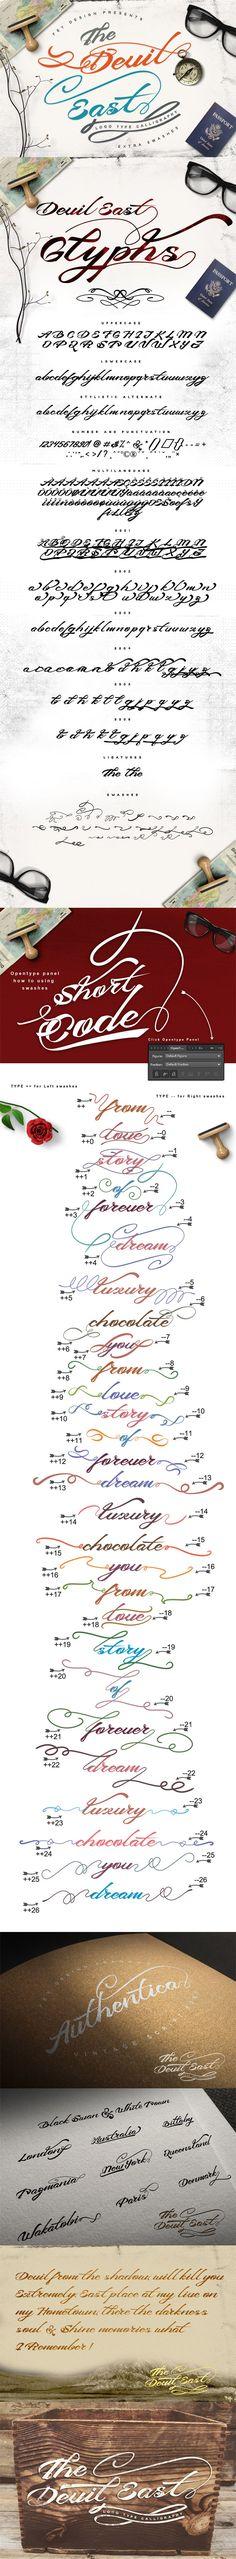 Hand Lettering Fonts, Typography Fonts, Script Fonts, Vintage Fonts, Vintage Typography, Romantic Fonts, Professional Fonts, Graffiti Font, Retro Font